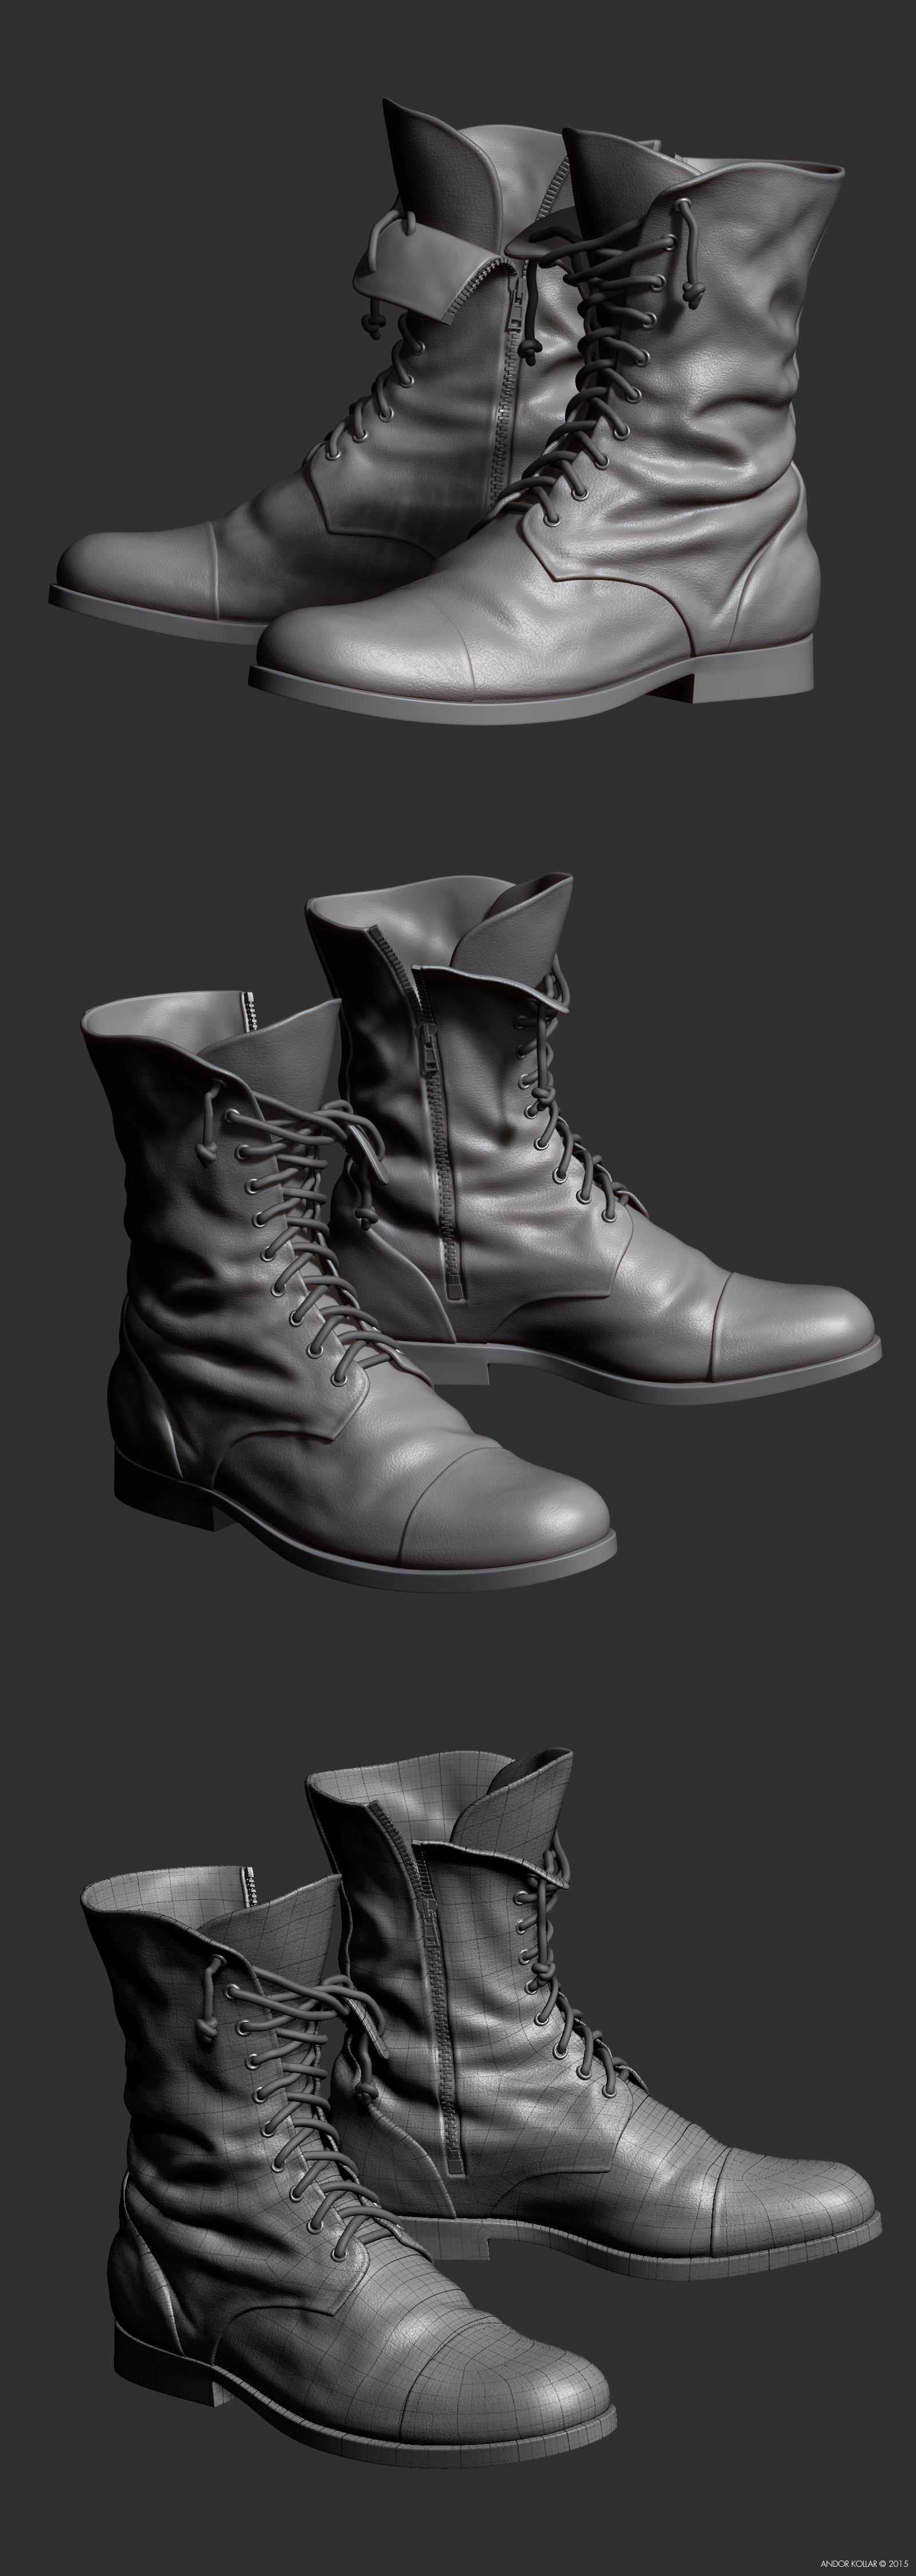 Andor-Kollar_Soldier-Boot